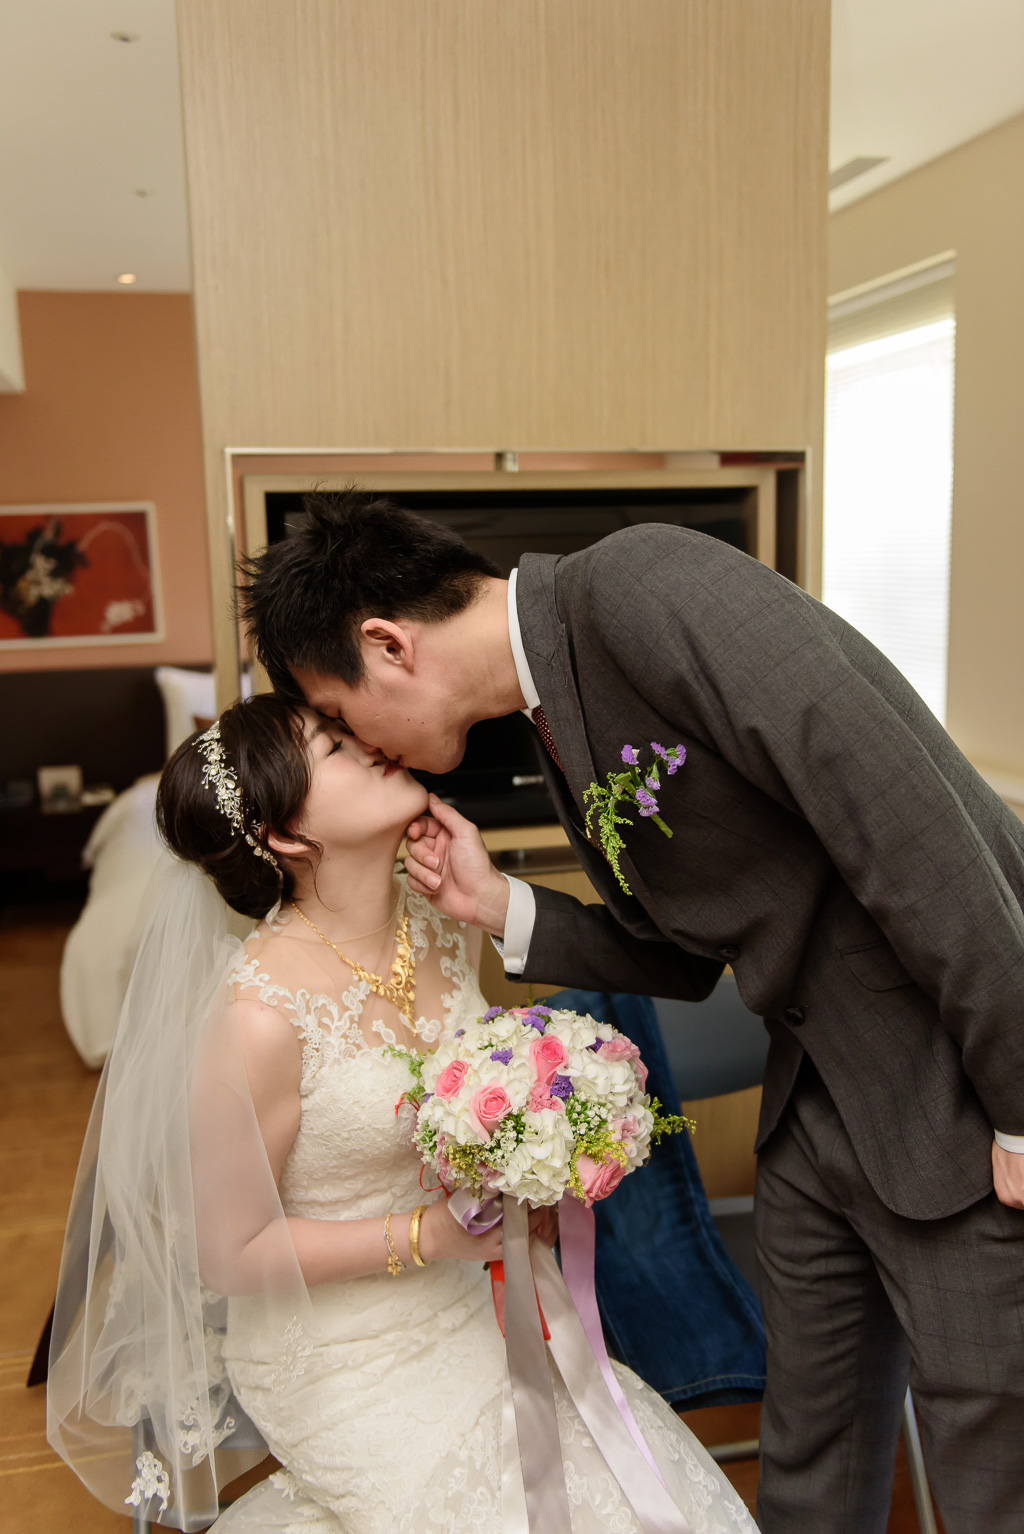 wedding day,婚攝小勇,台北婚攝,晶華,台北國賓,台北國賓婚宴 ,愛瑞思,Miko,新秘,-053